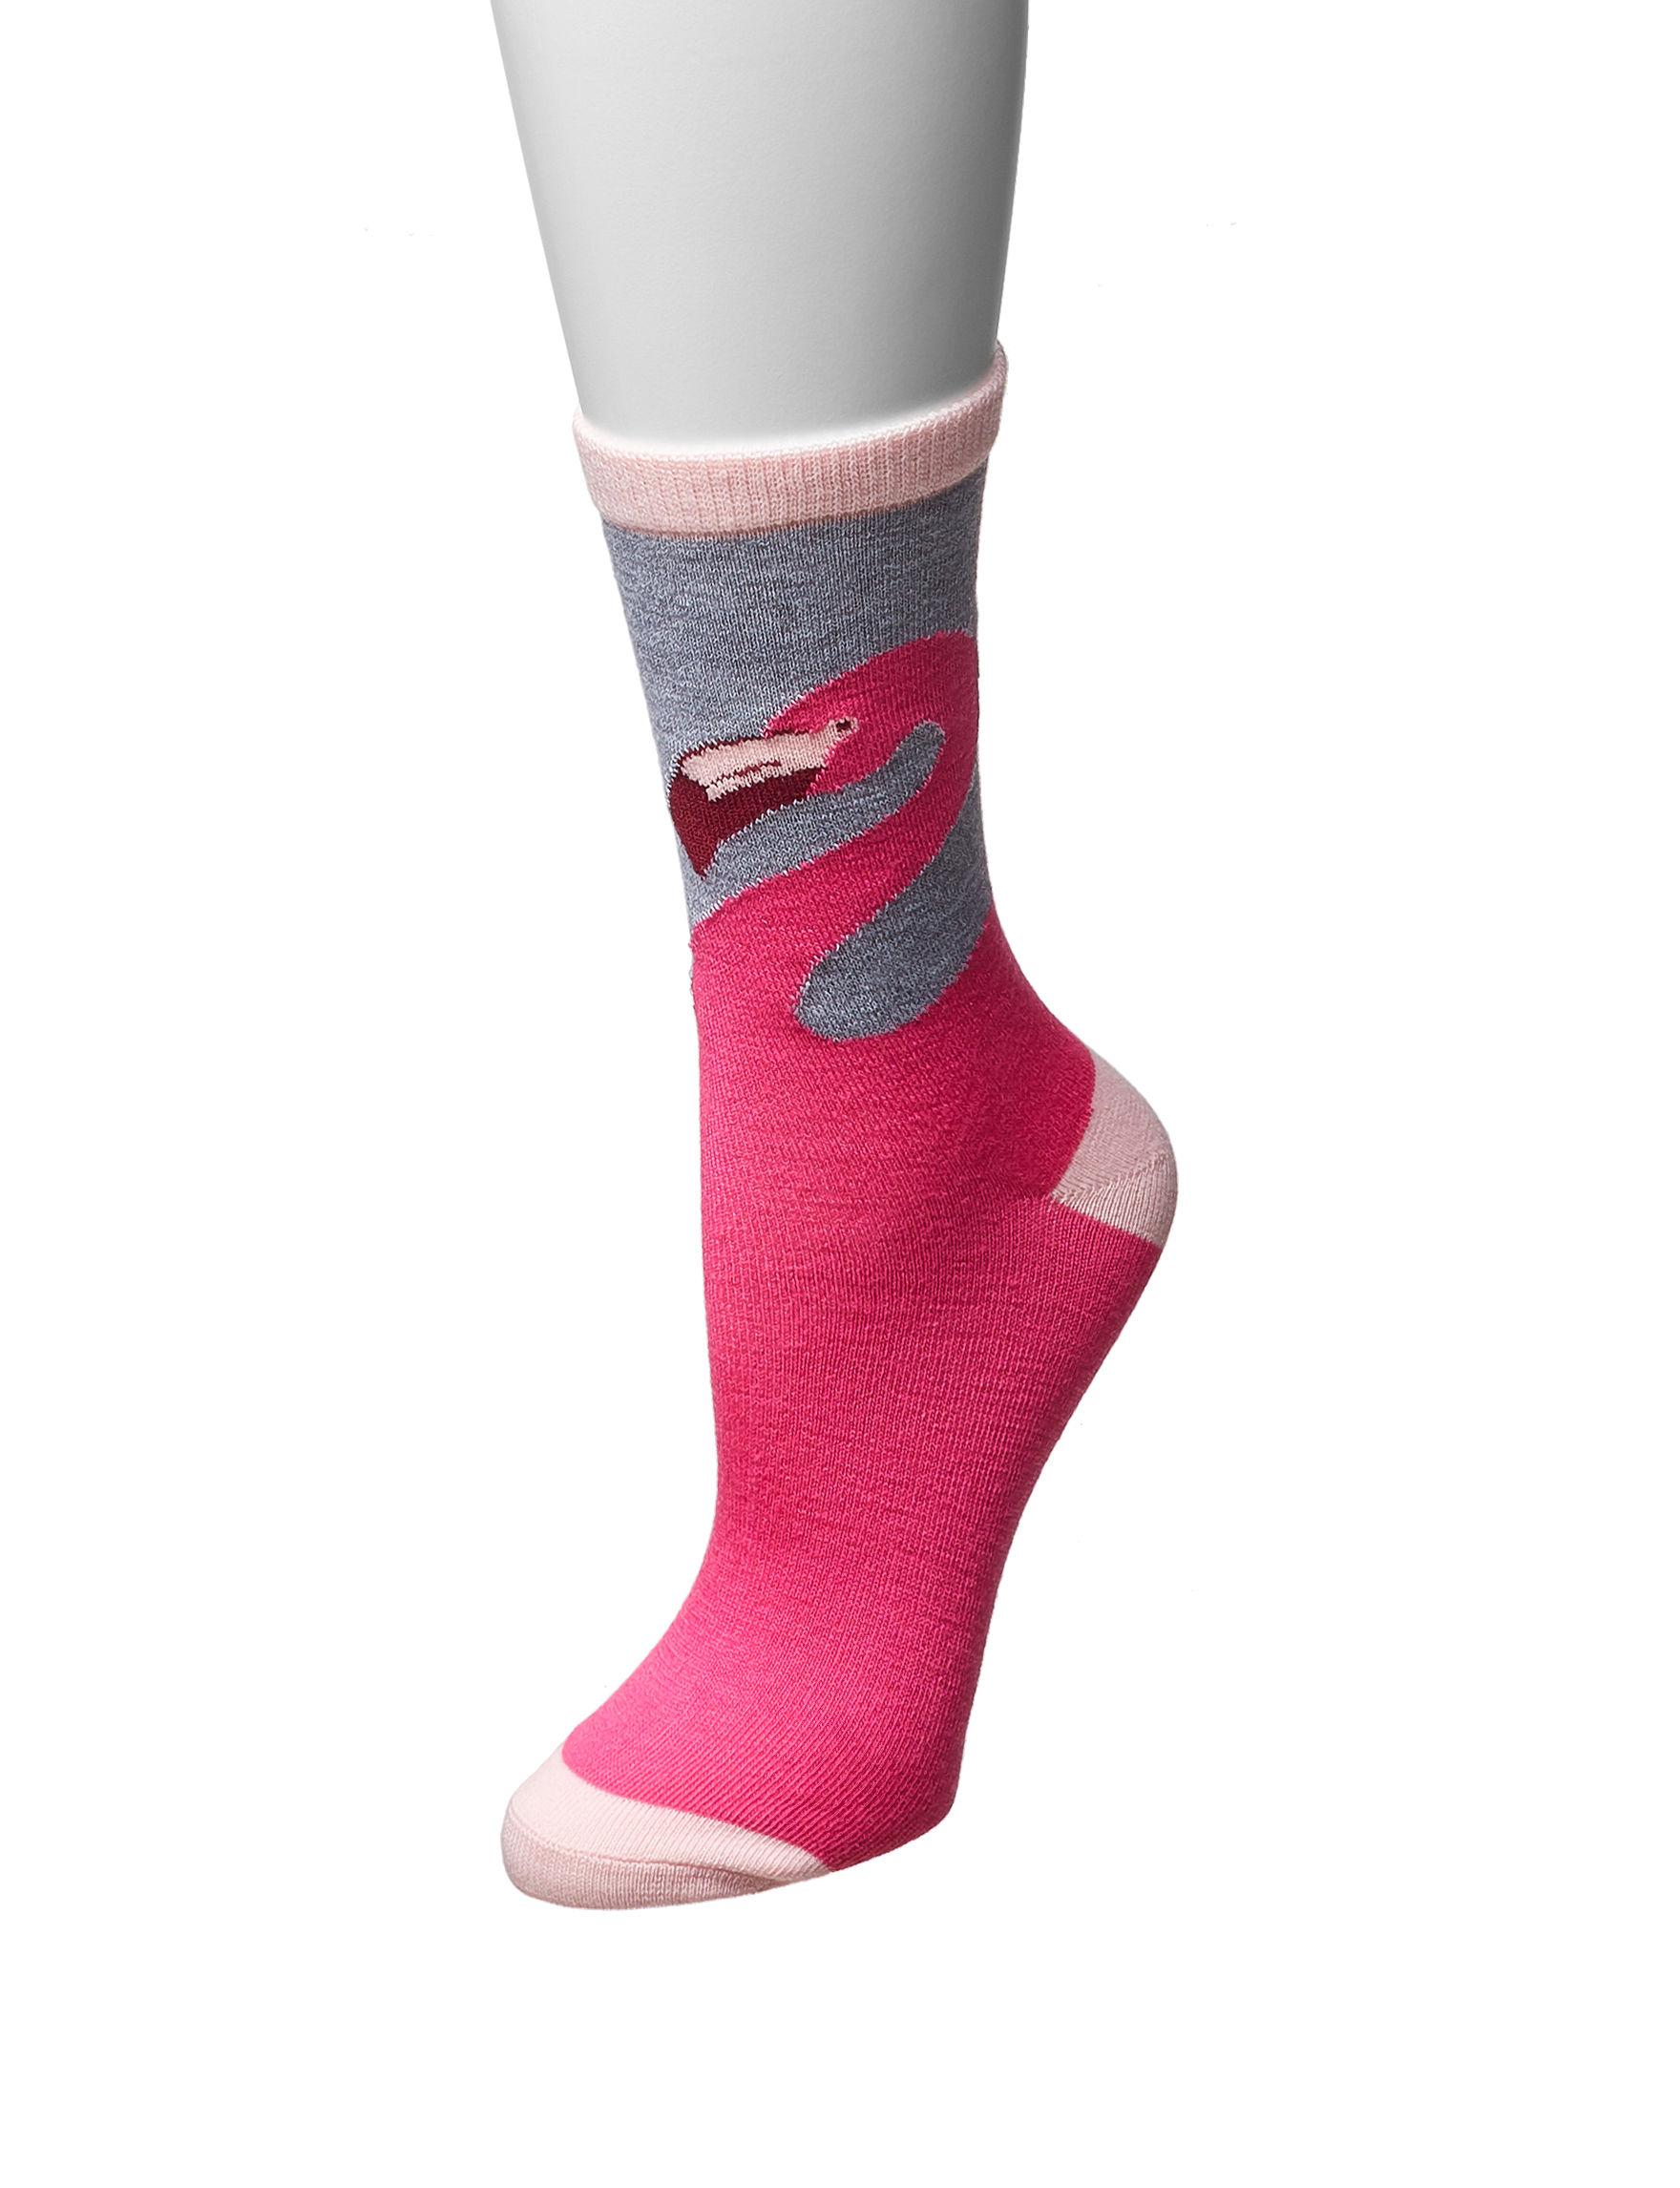 Sox & Co Pink Socks